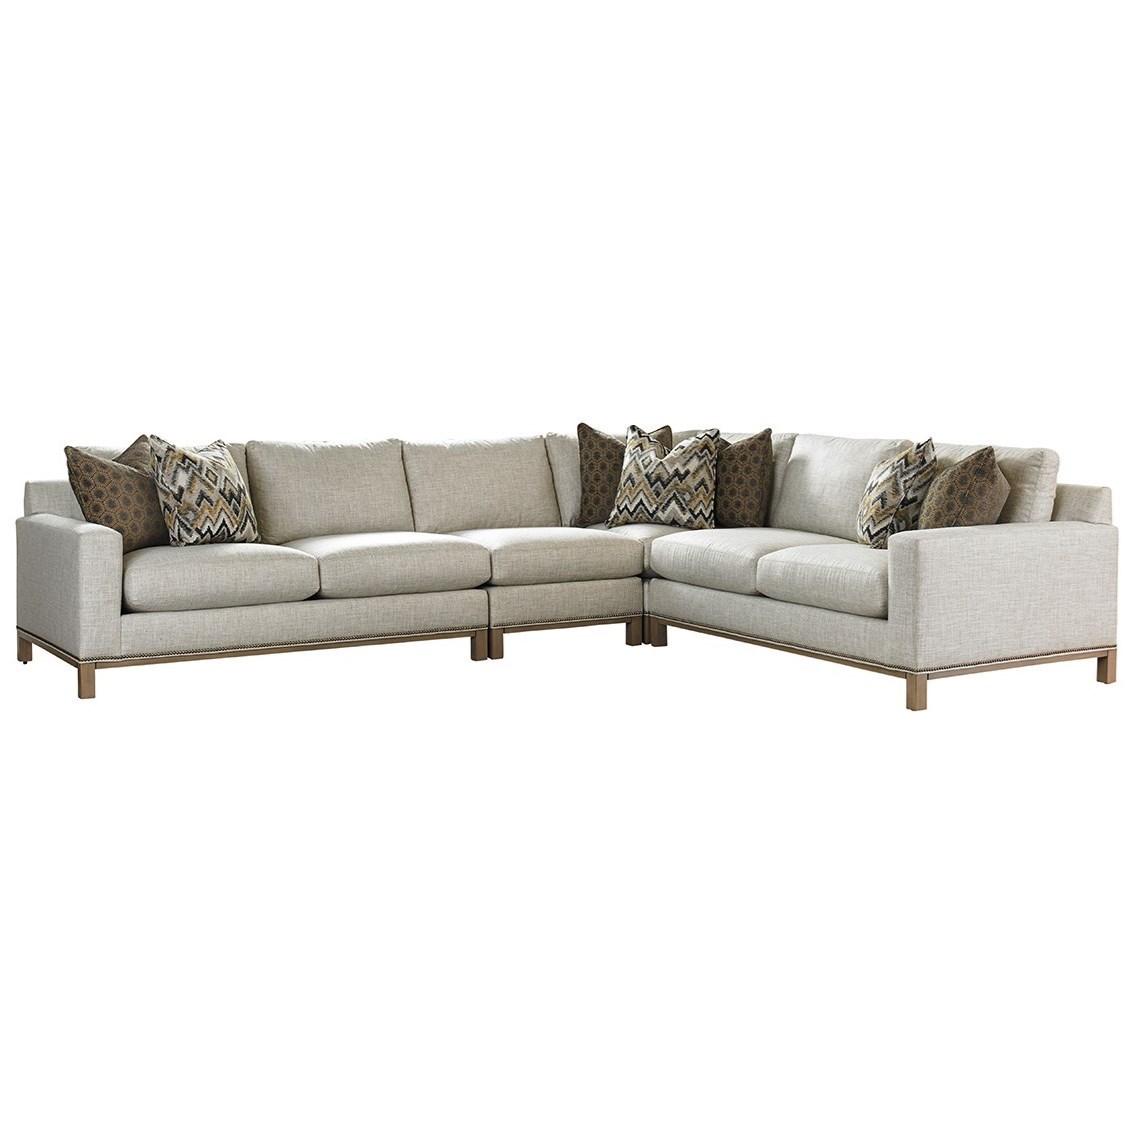 Lexington Upholstery Chronicle 4 Pc Sectional Sofa by Lexington at Jacksonville Furniture Mart